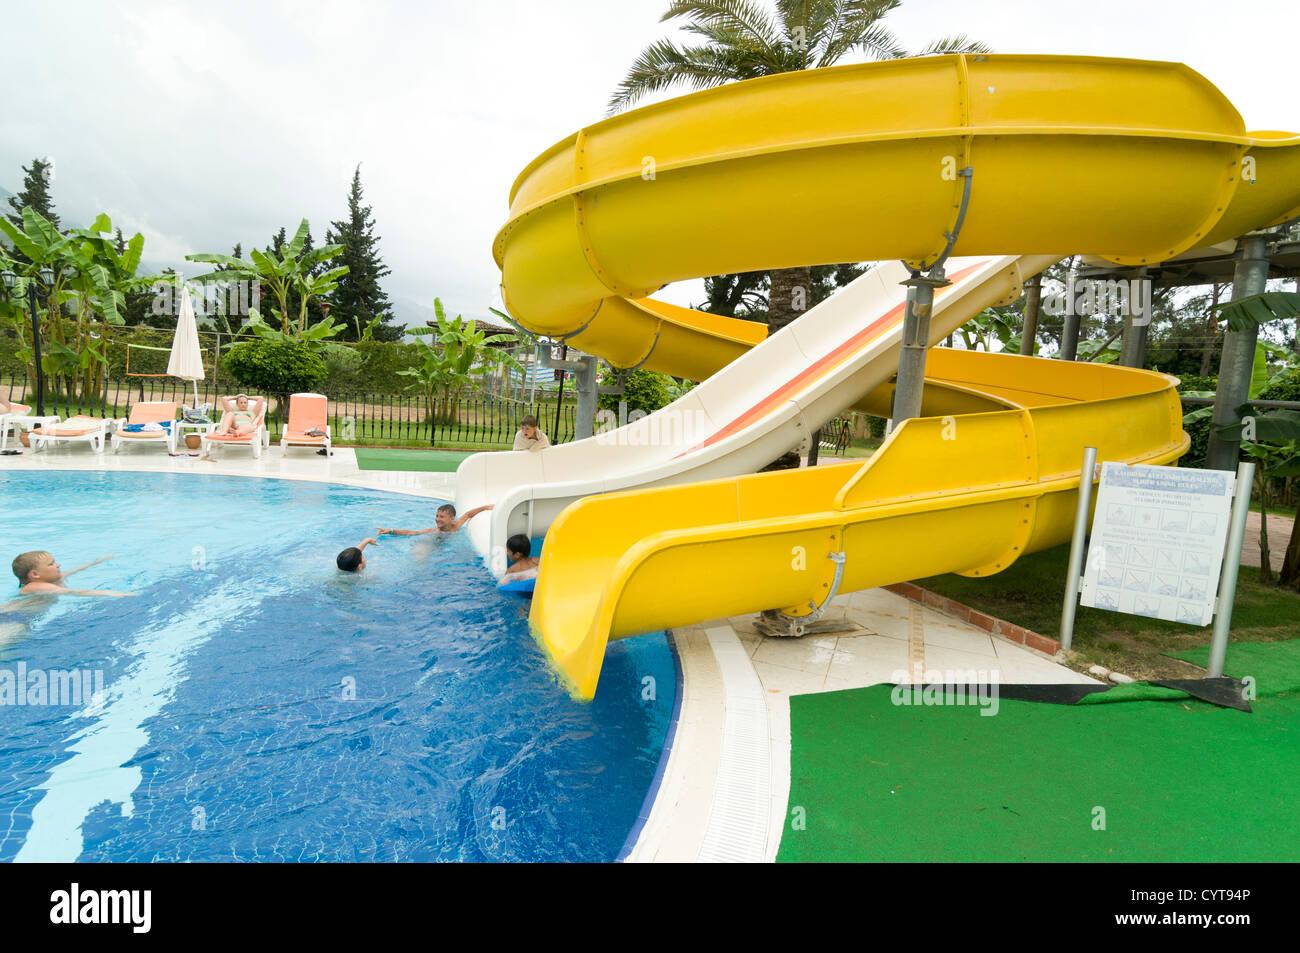 Water Slide Children Pool Kid Sunbed Hotel